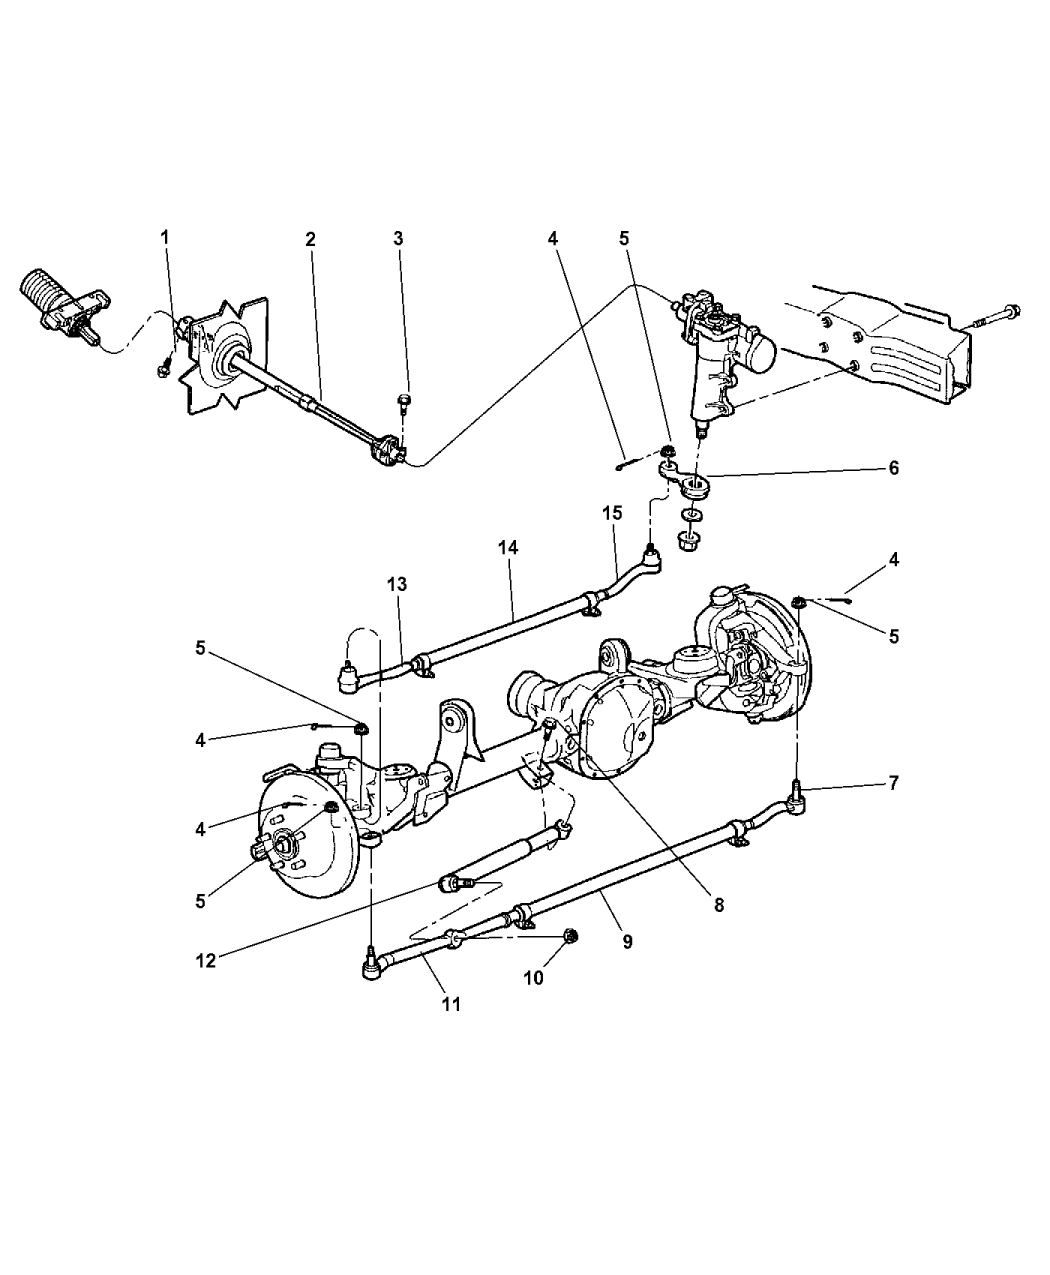 2002 Jeep Grand Cherokee Parts Diagram